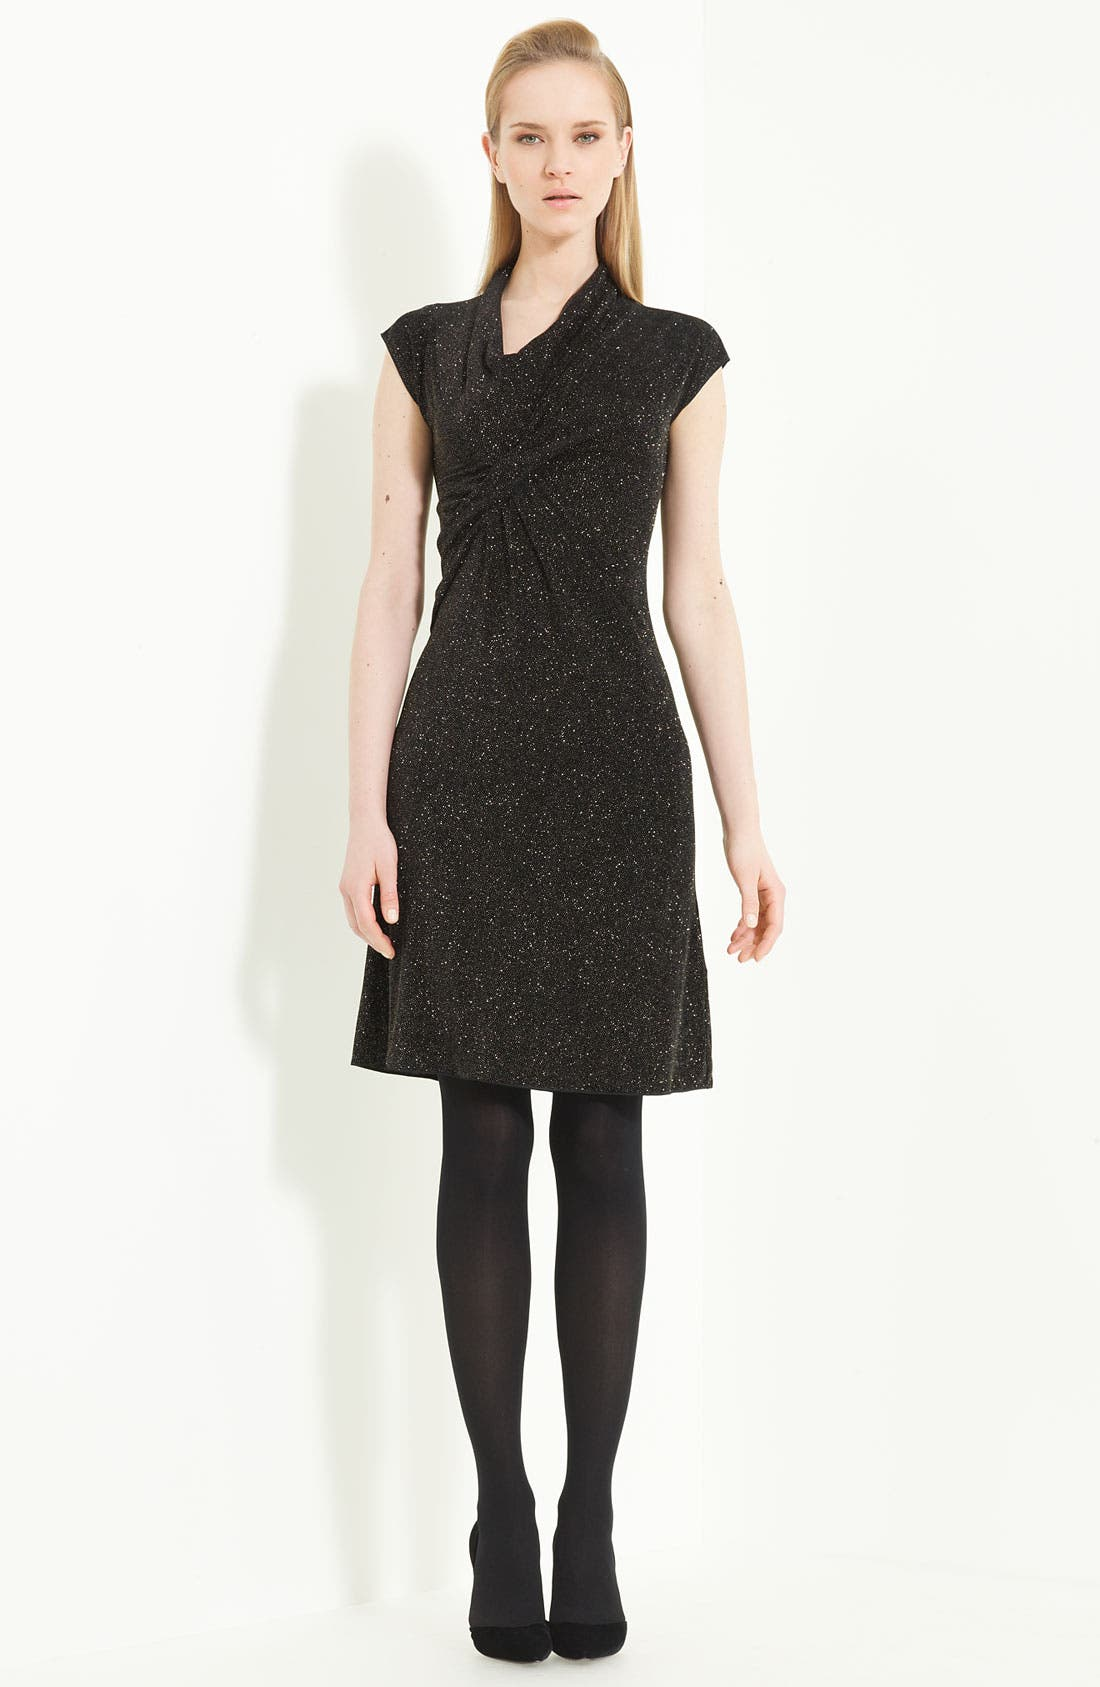 Alternate Image 1 Selected - Armani Collezioni 'Glitter Gold' Jersey Dress